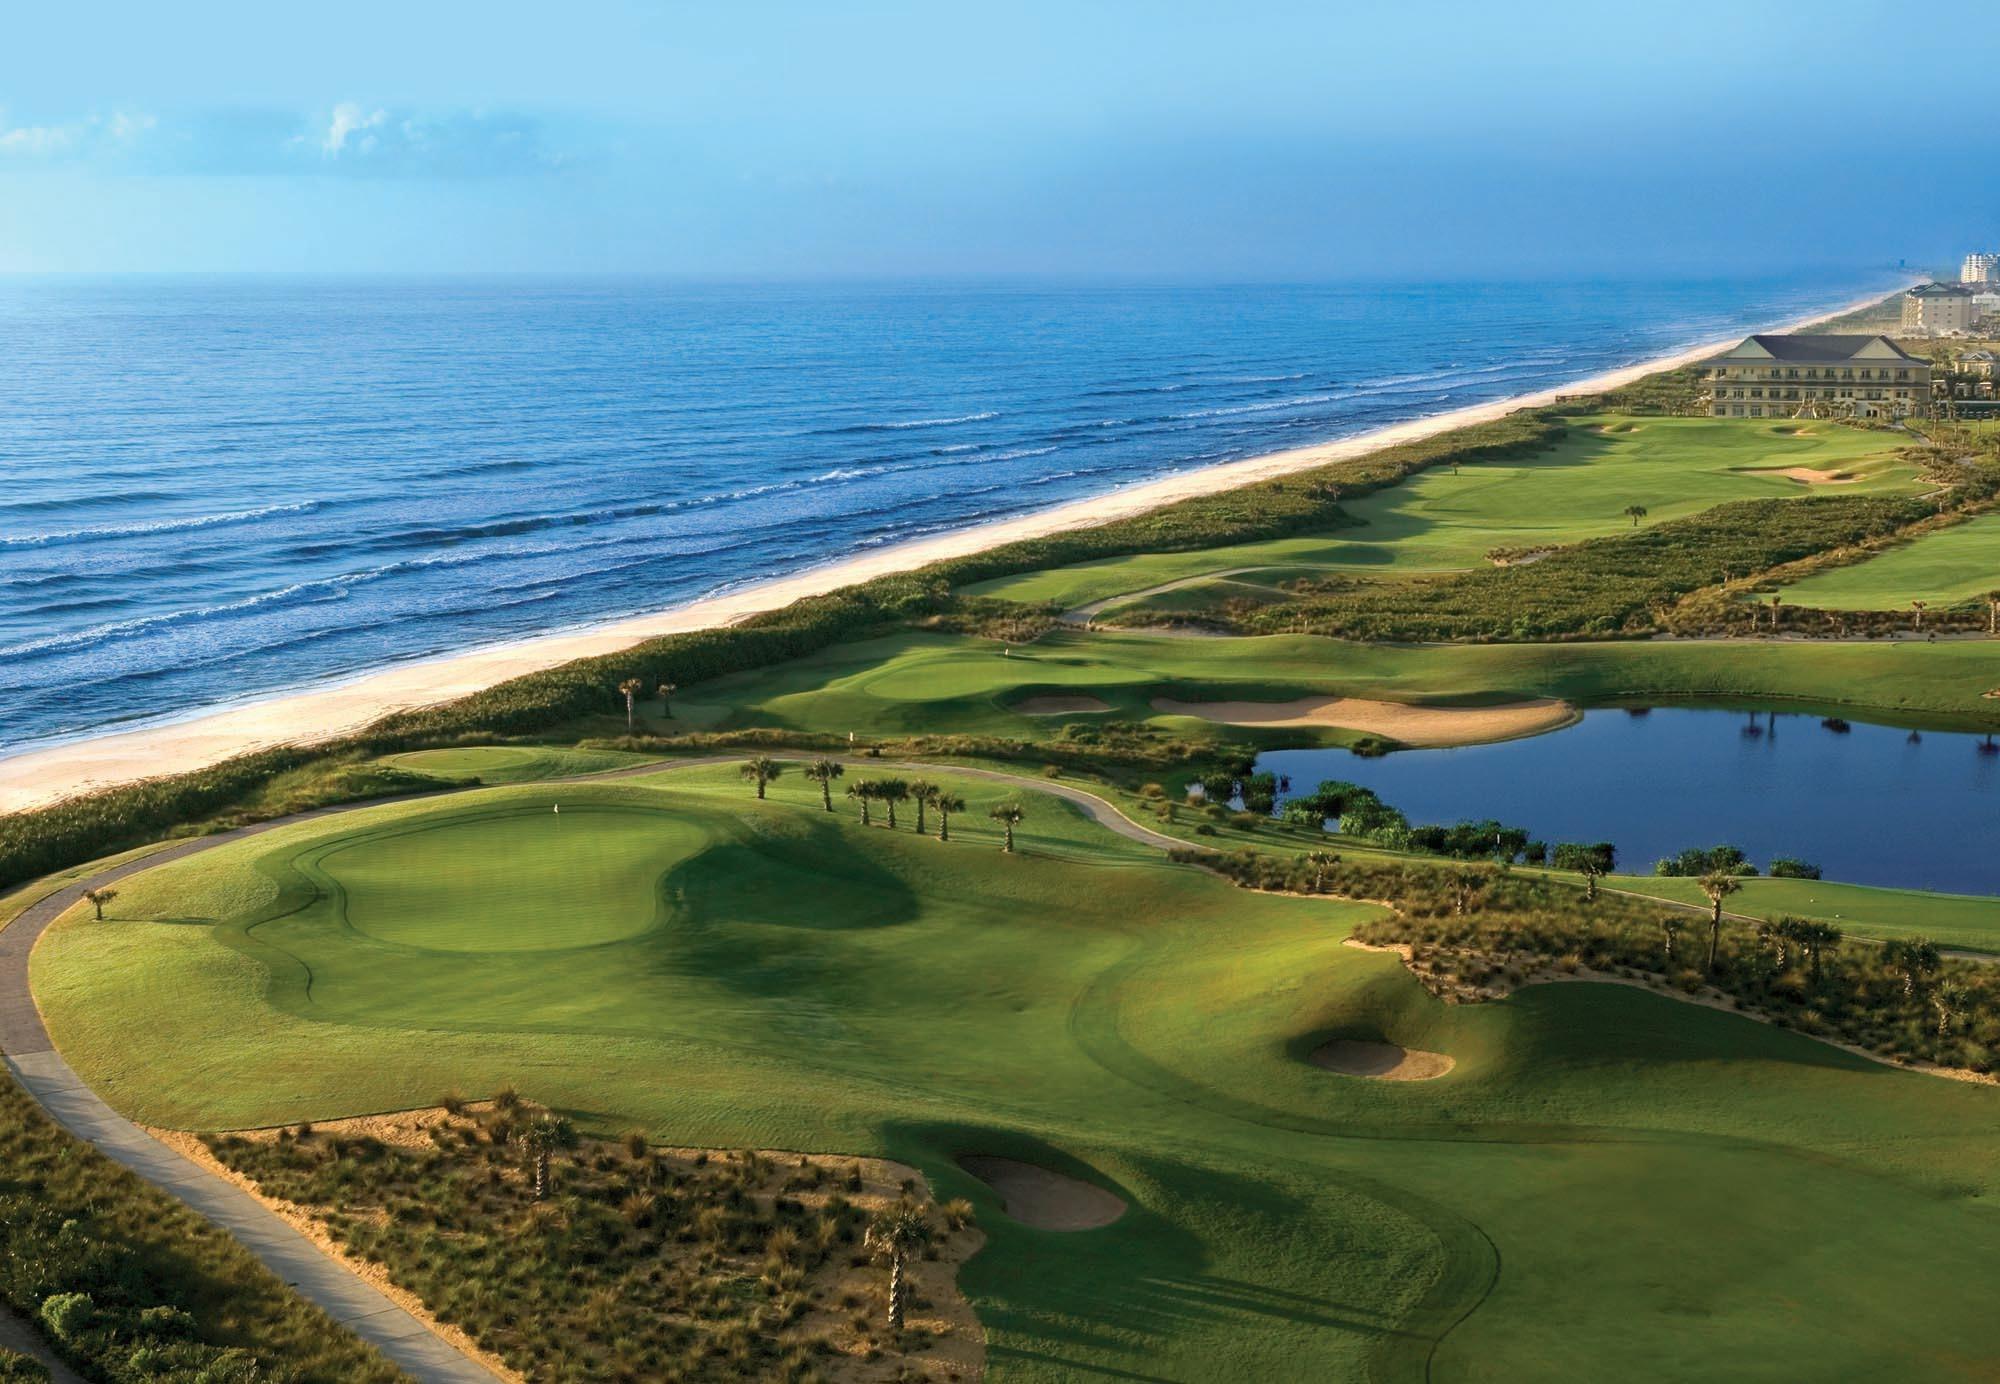 hammock beach resort   special stay  u0026 play packages  rh   golfzoo